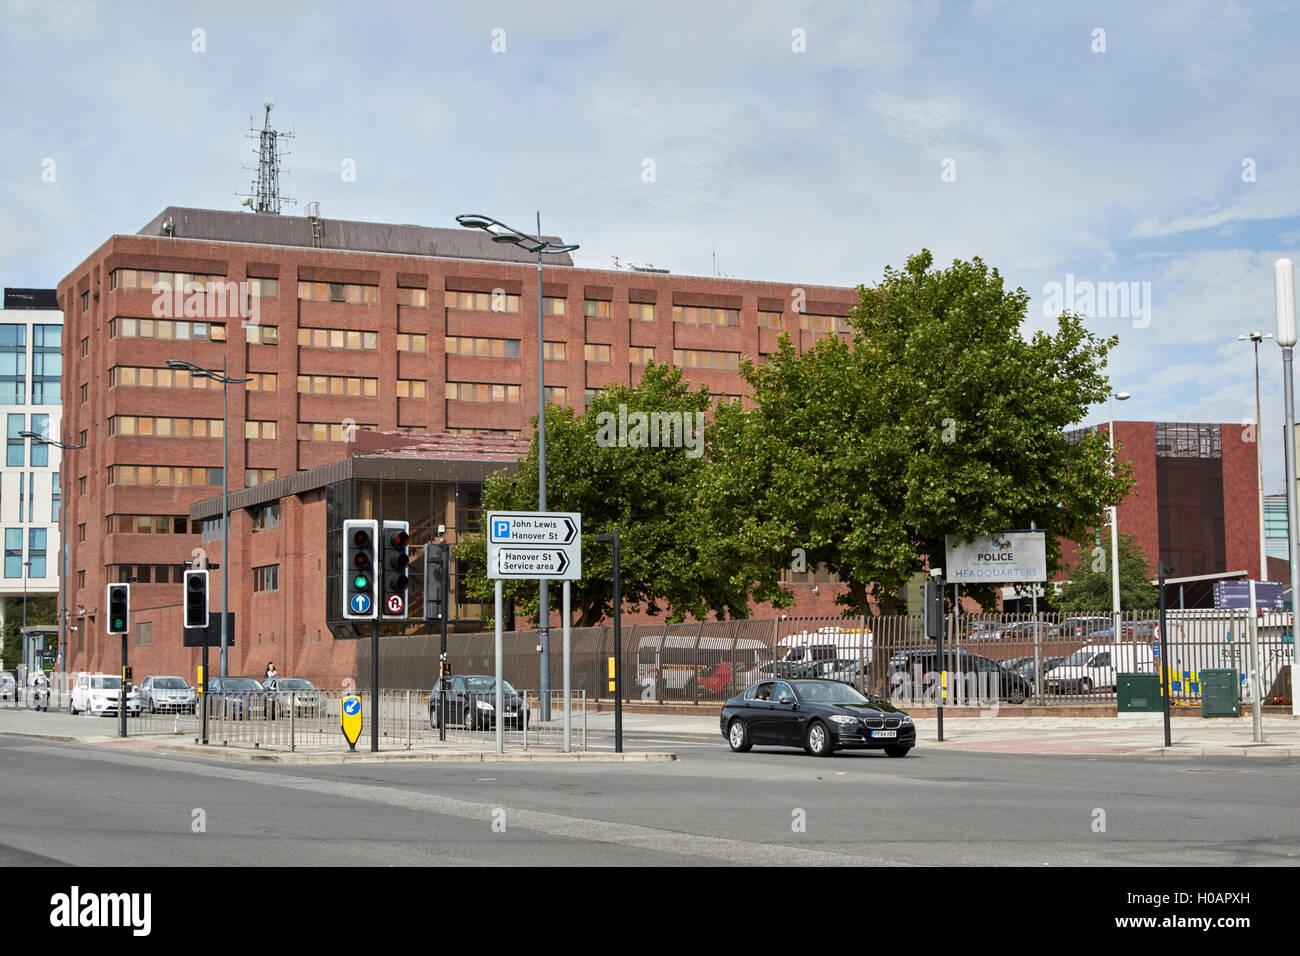 merseyside police headquarters hq Liverpool Merseyside UK - Stock Image